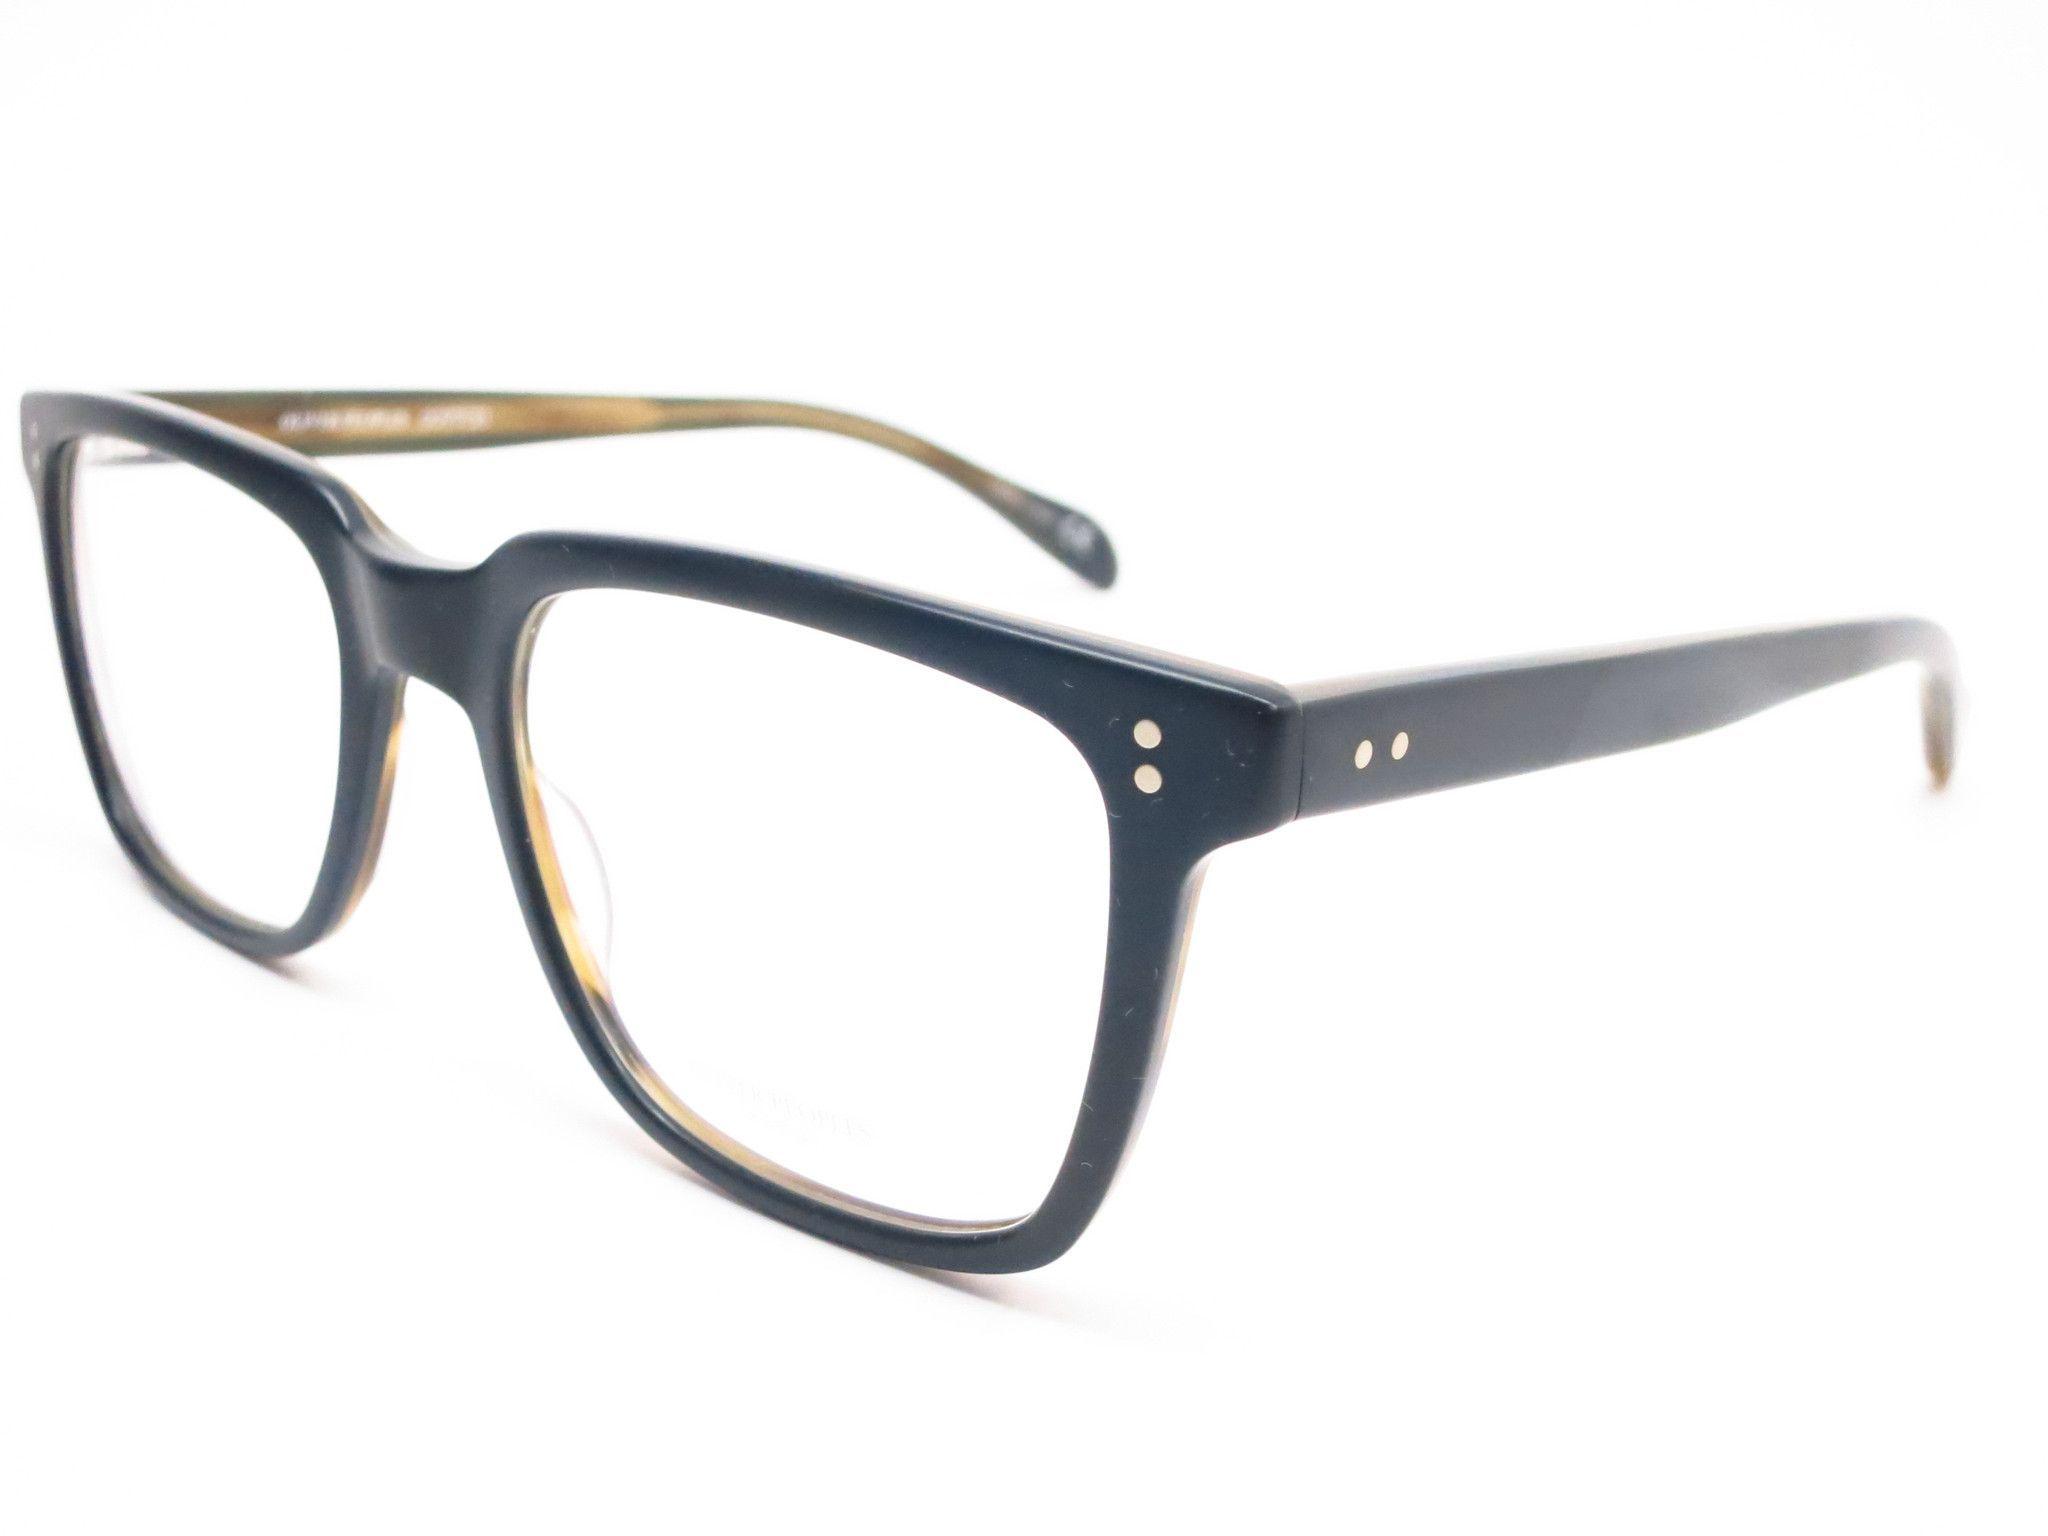 49b5b34dba Oliver Peoples NDG OV 5031 1282 Matte Black   Olive Tortoise Eyeglasses